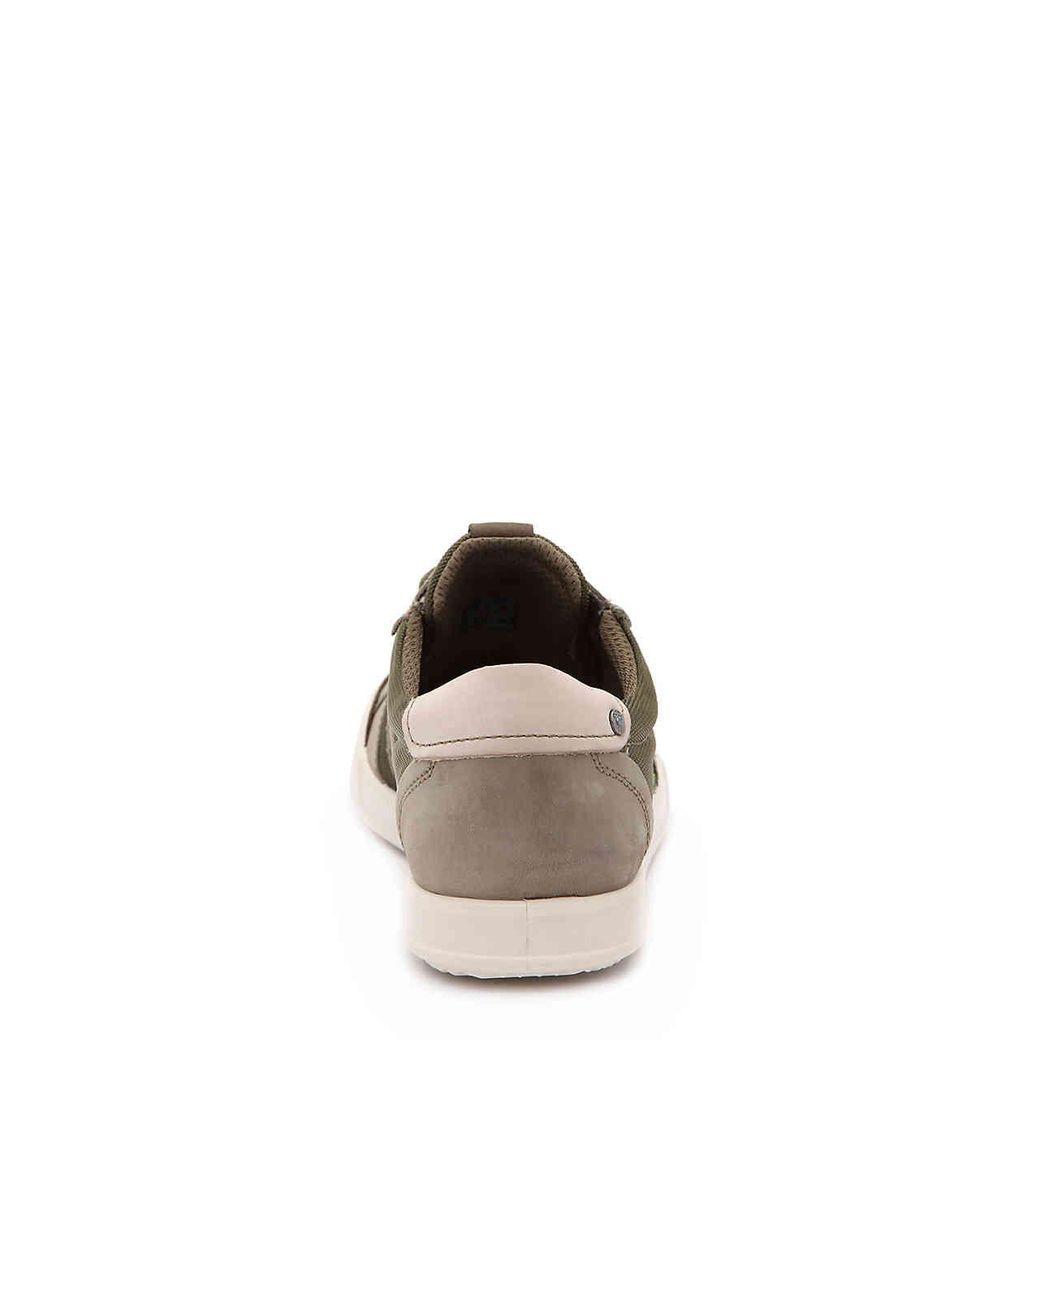 Ecco Collin 2.0 Sneaker in Olive Green